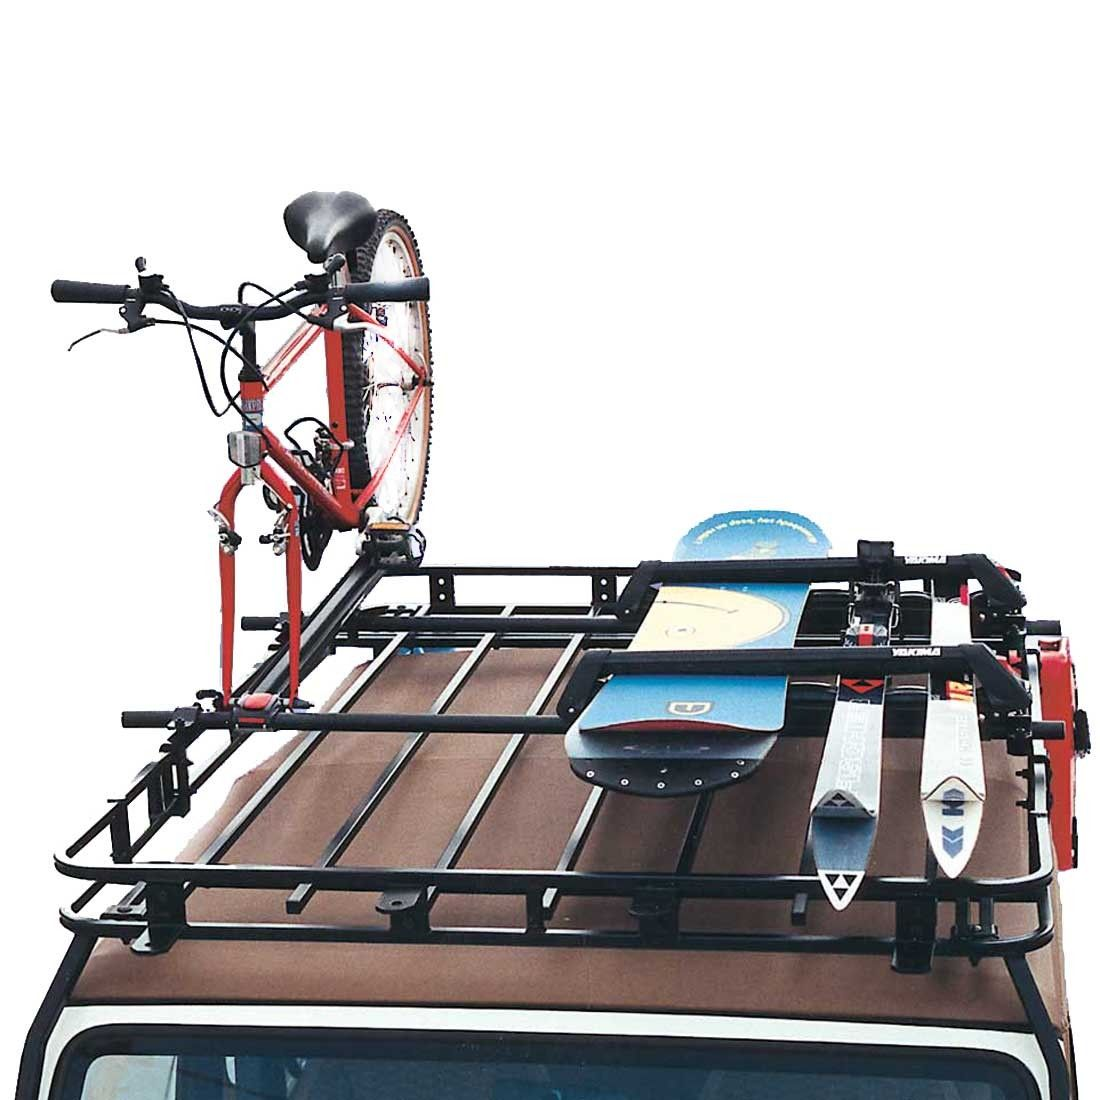 Yakima Thule Crossbar Adapters 4 Roof Rack Yakima Racks Truck Roof Rack